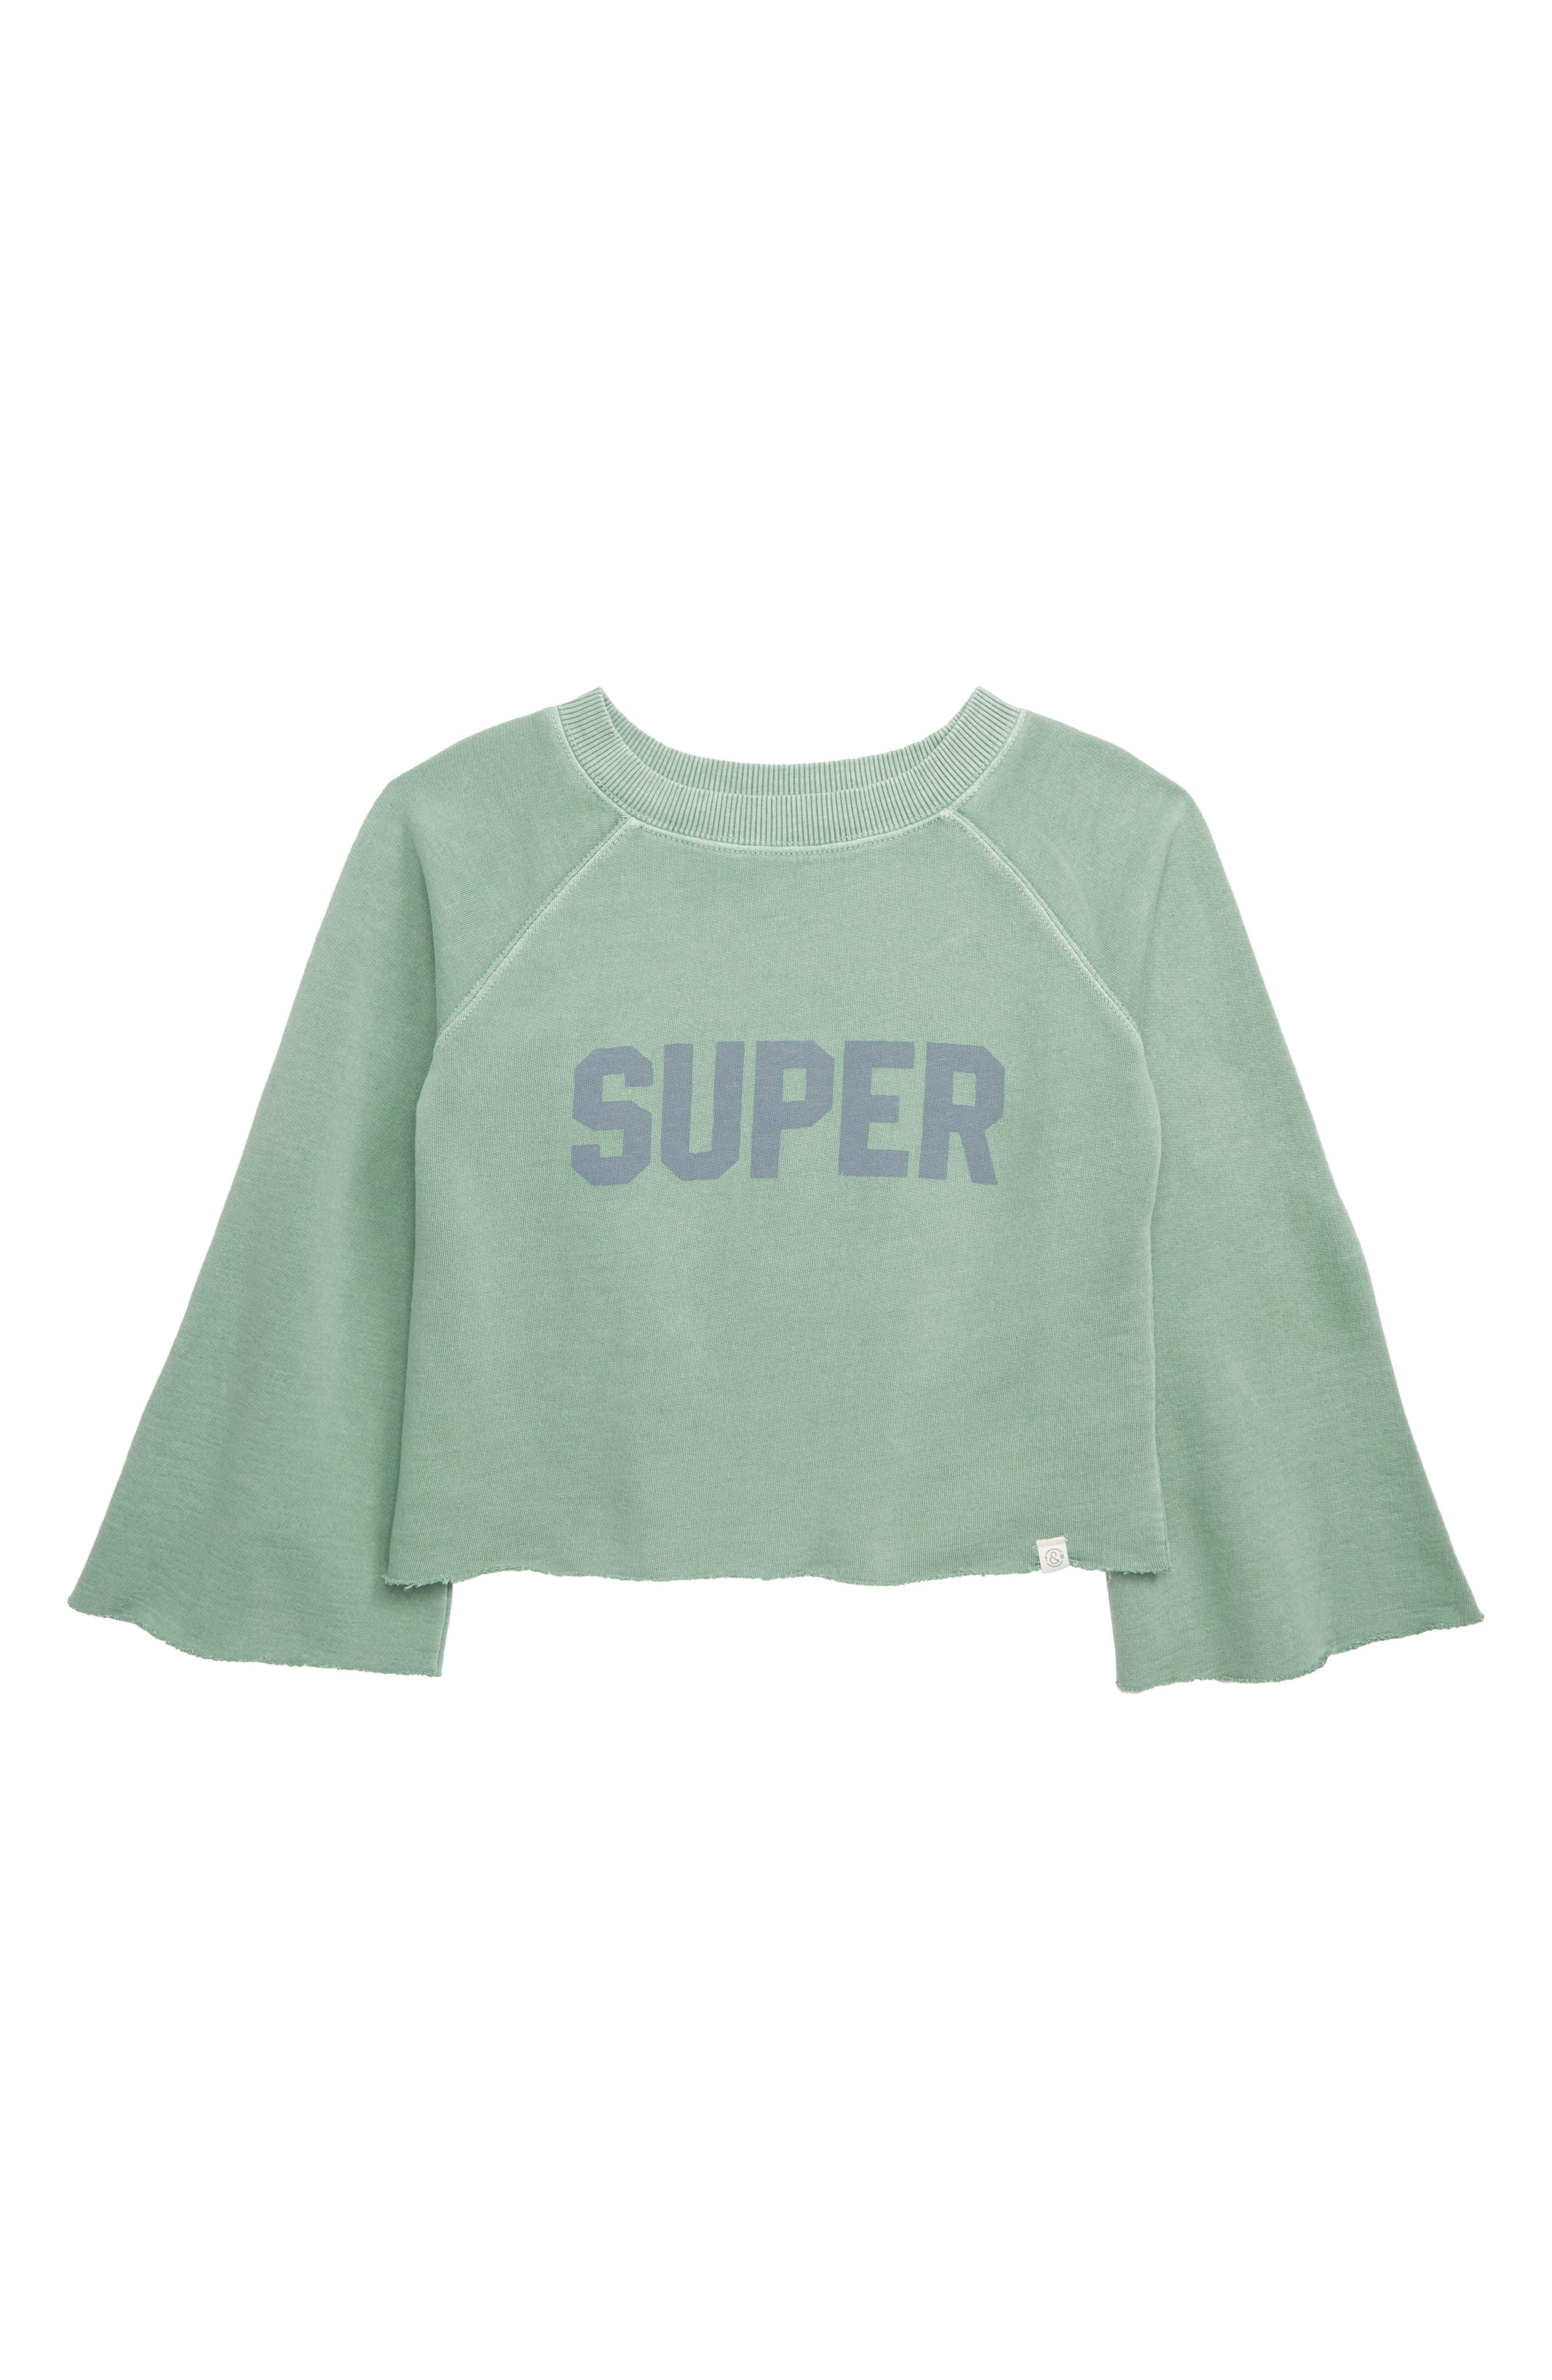 TREASURE & BOND, Washed Wide Sleeve Sweatshirt, Main thumbnail 1, color, GREEN WING SUPER